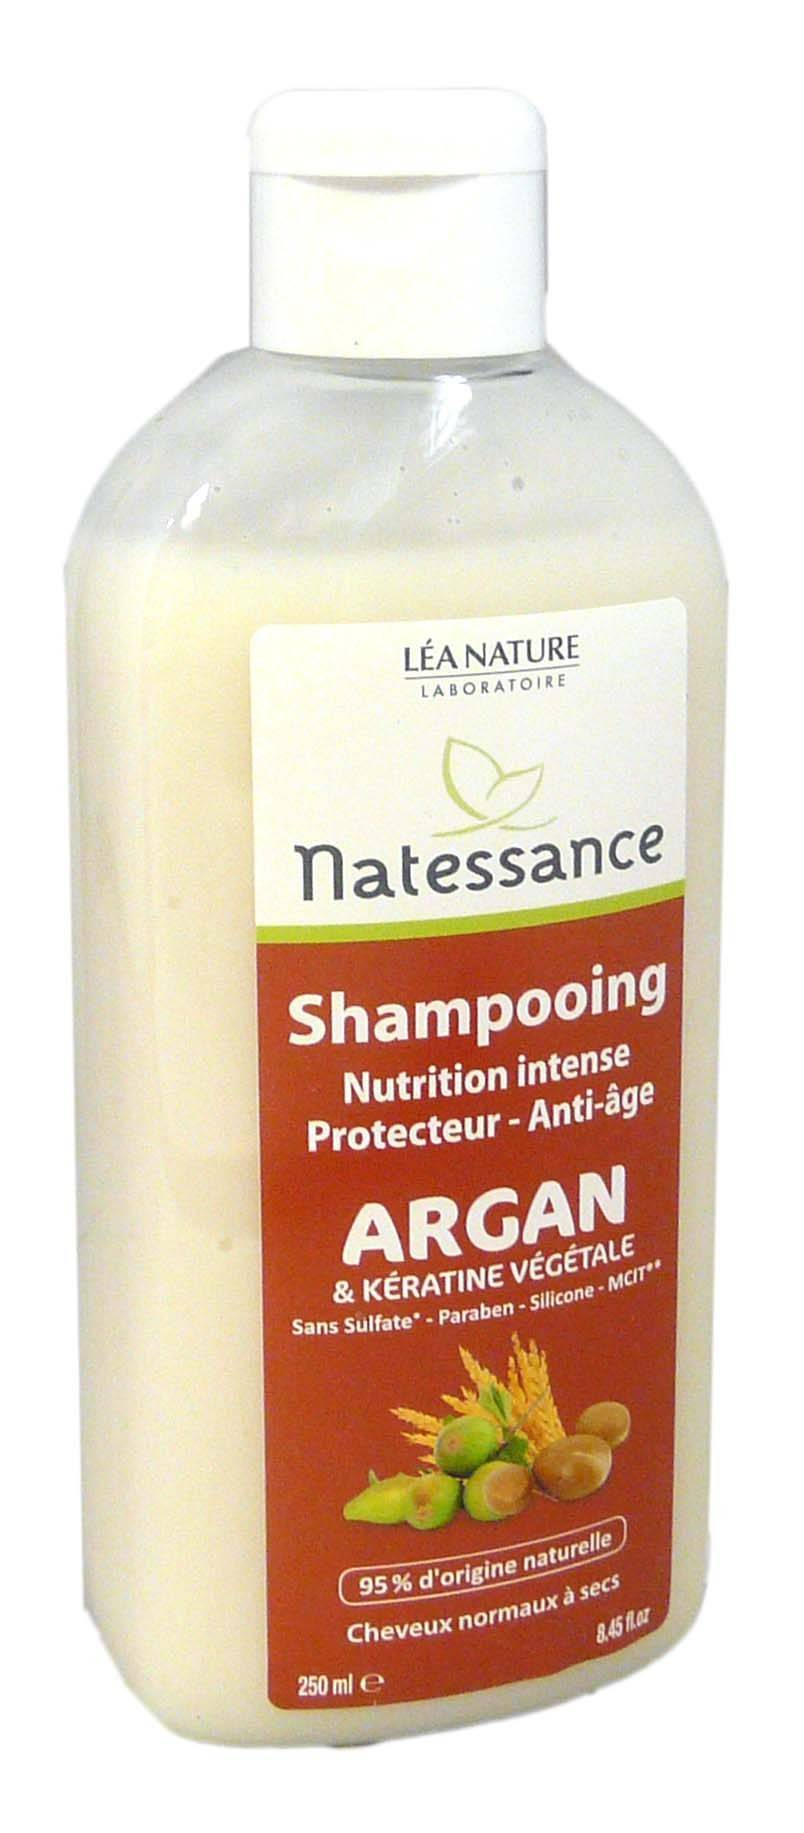 Natessance shampooing argan 250ml